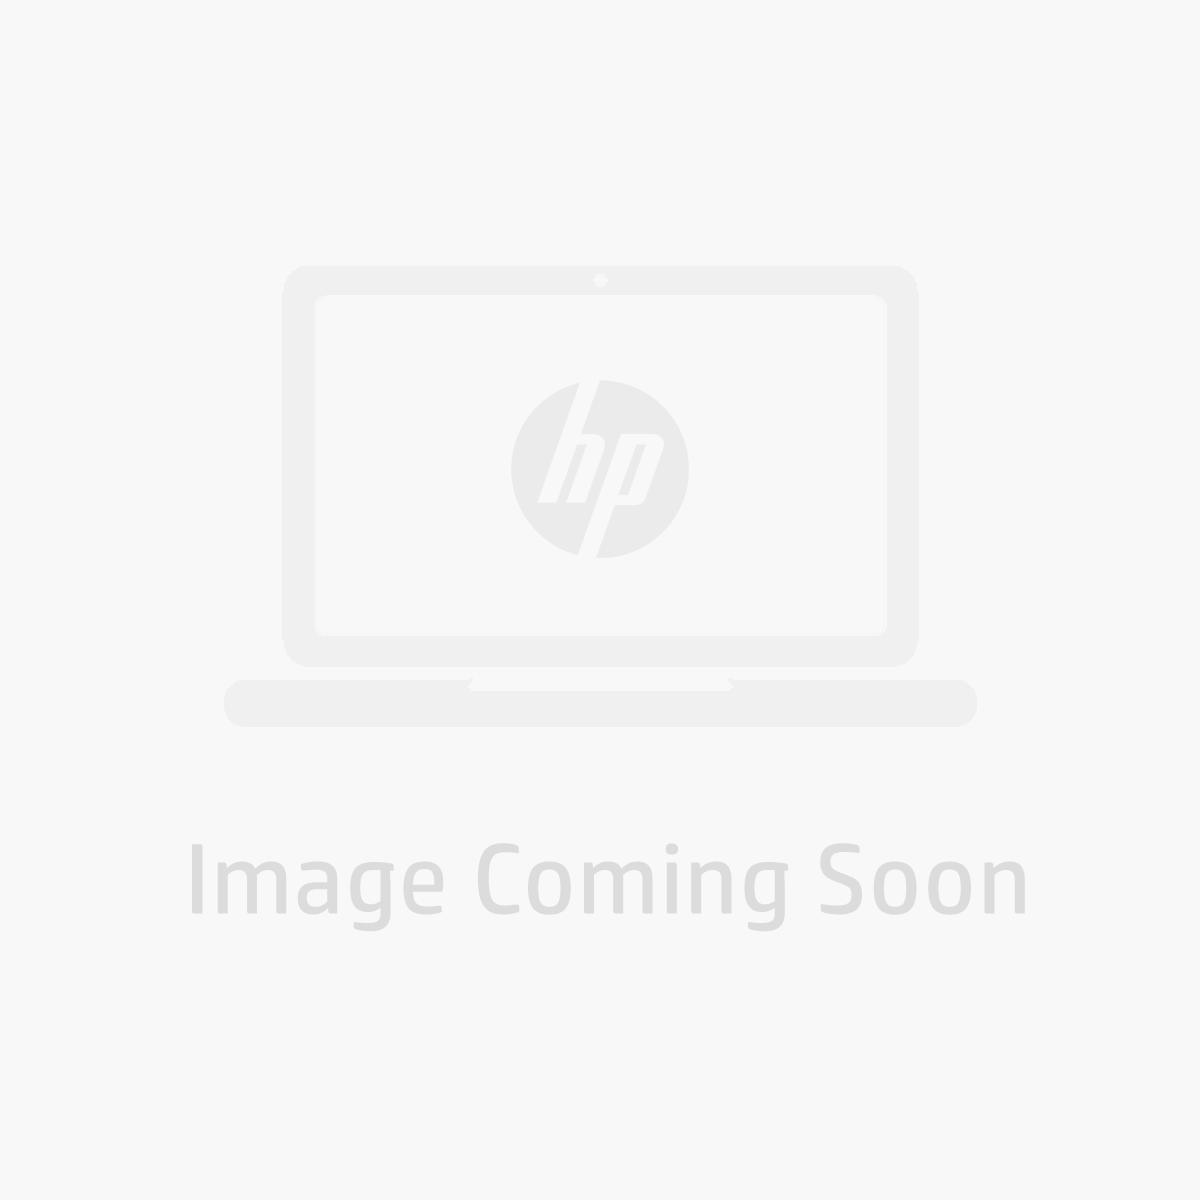 HP Colour LaserJet Professional CP5225 Printer